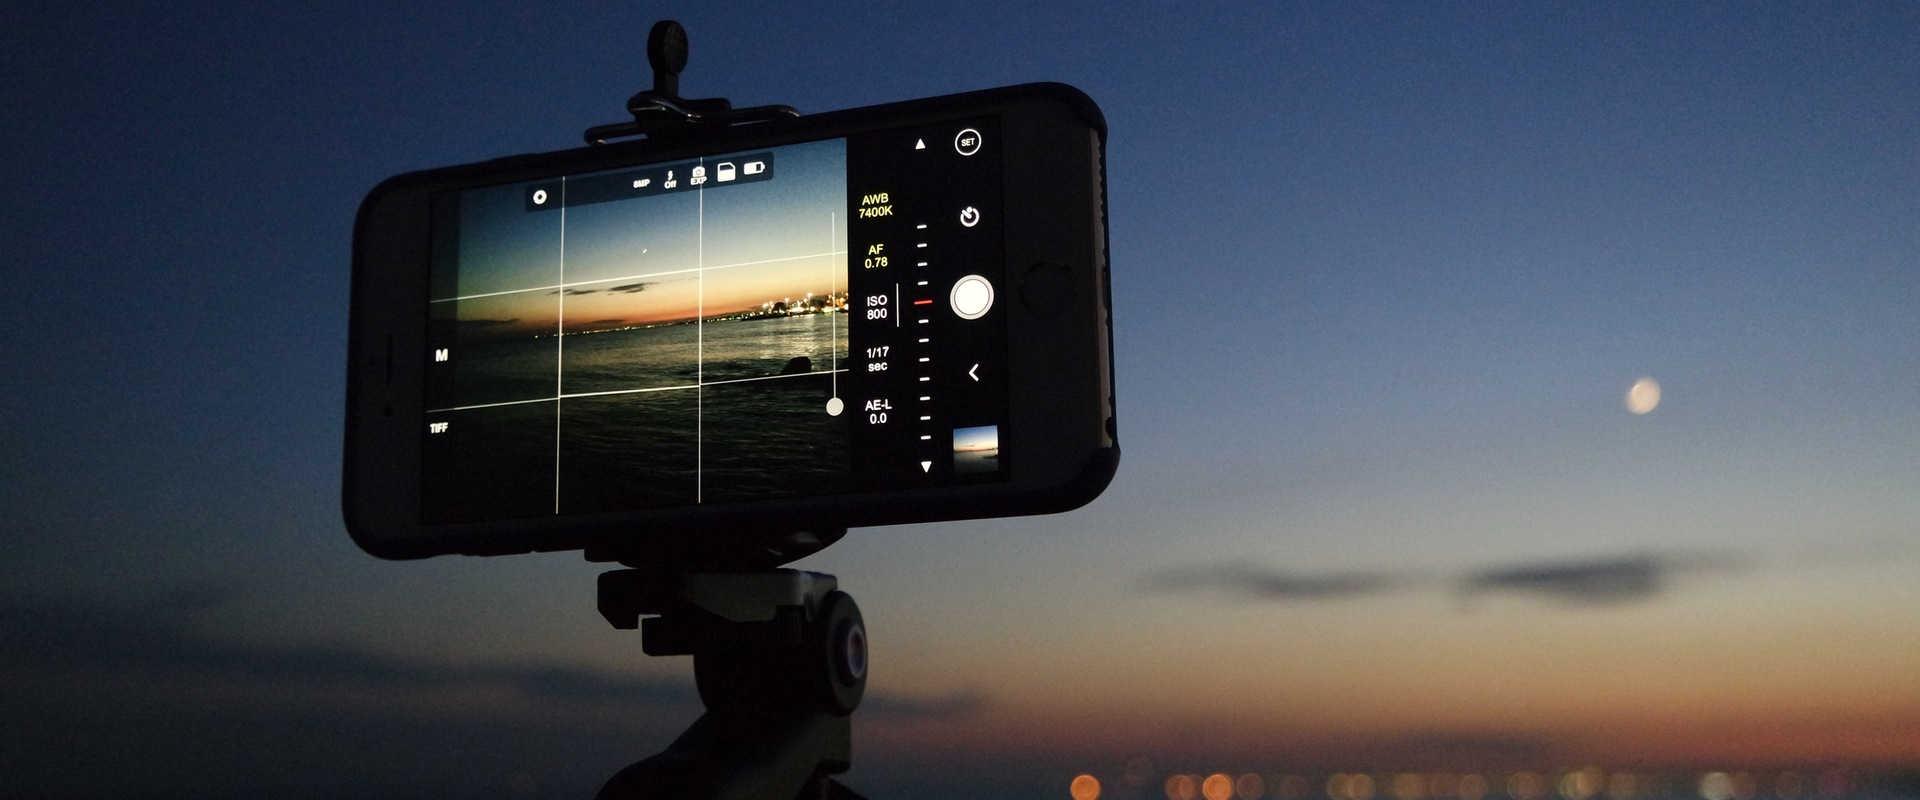 топ камер смартфонов 2016